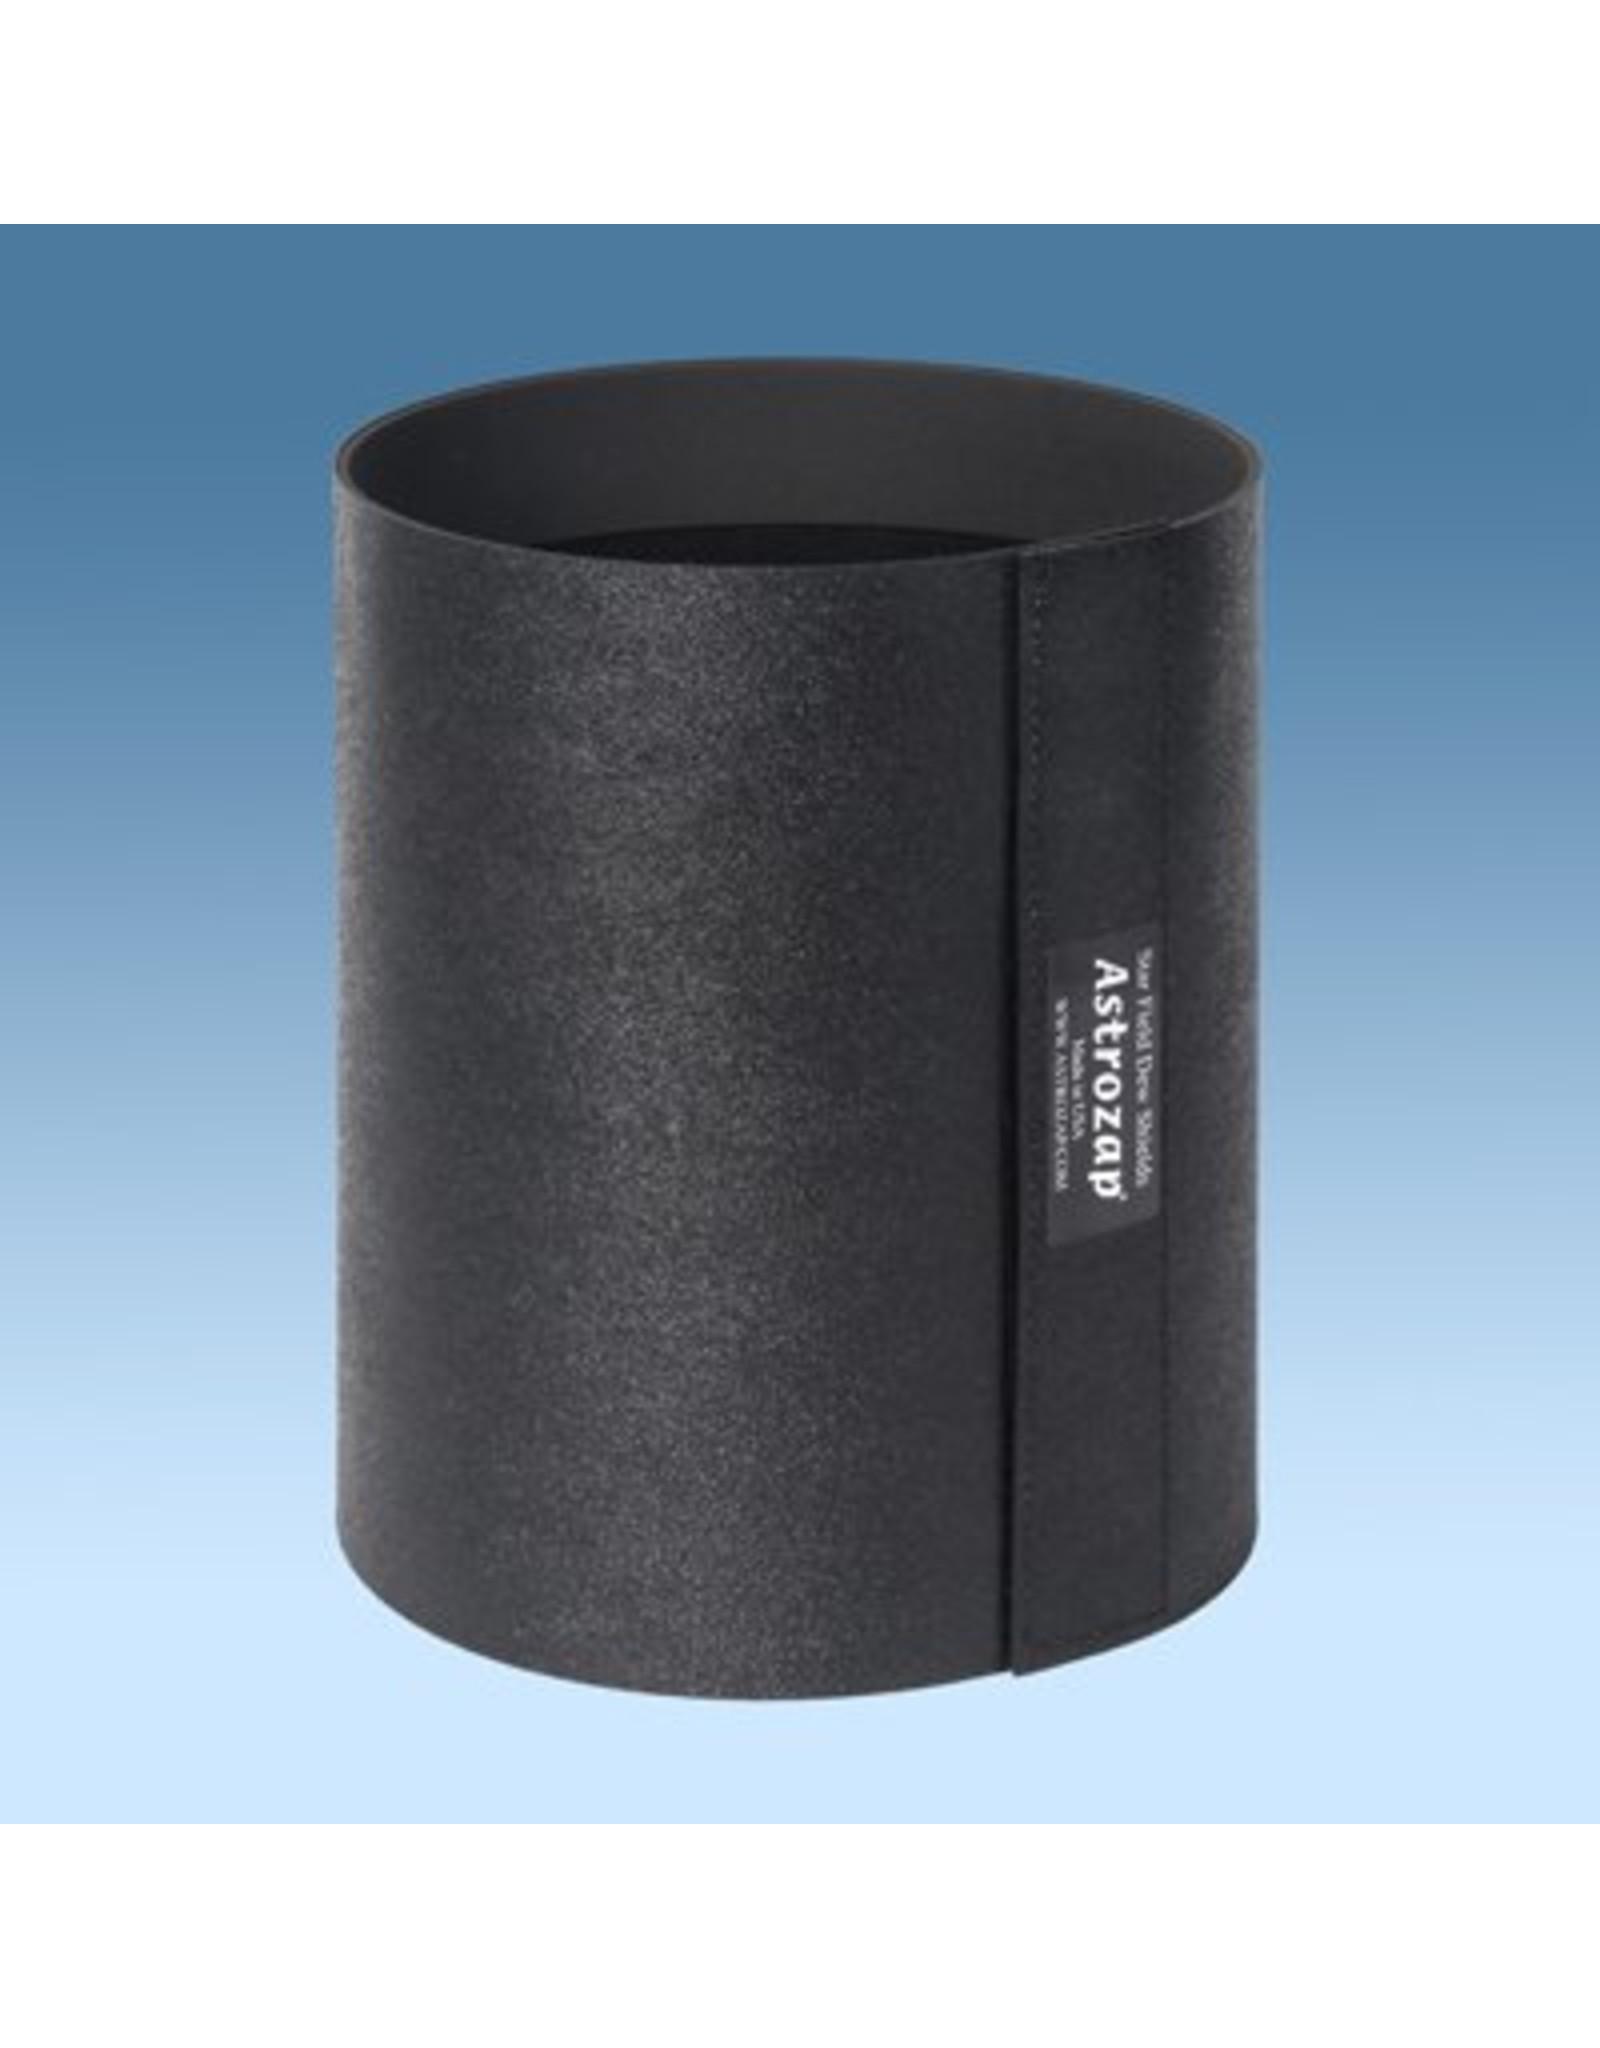 Astrozap Vixen VC 200L Flexi-Shield™ Flexible Dew Shield with Notch